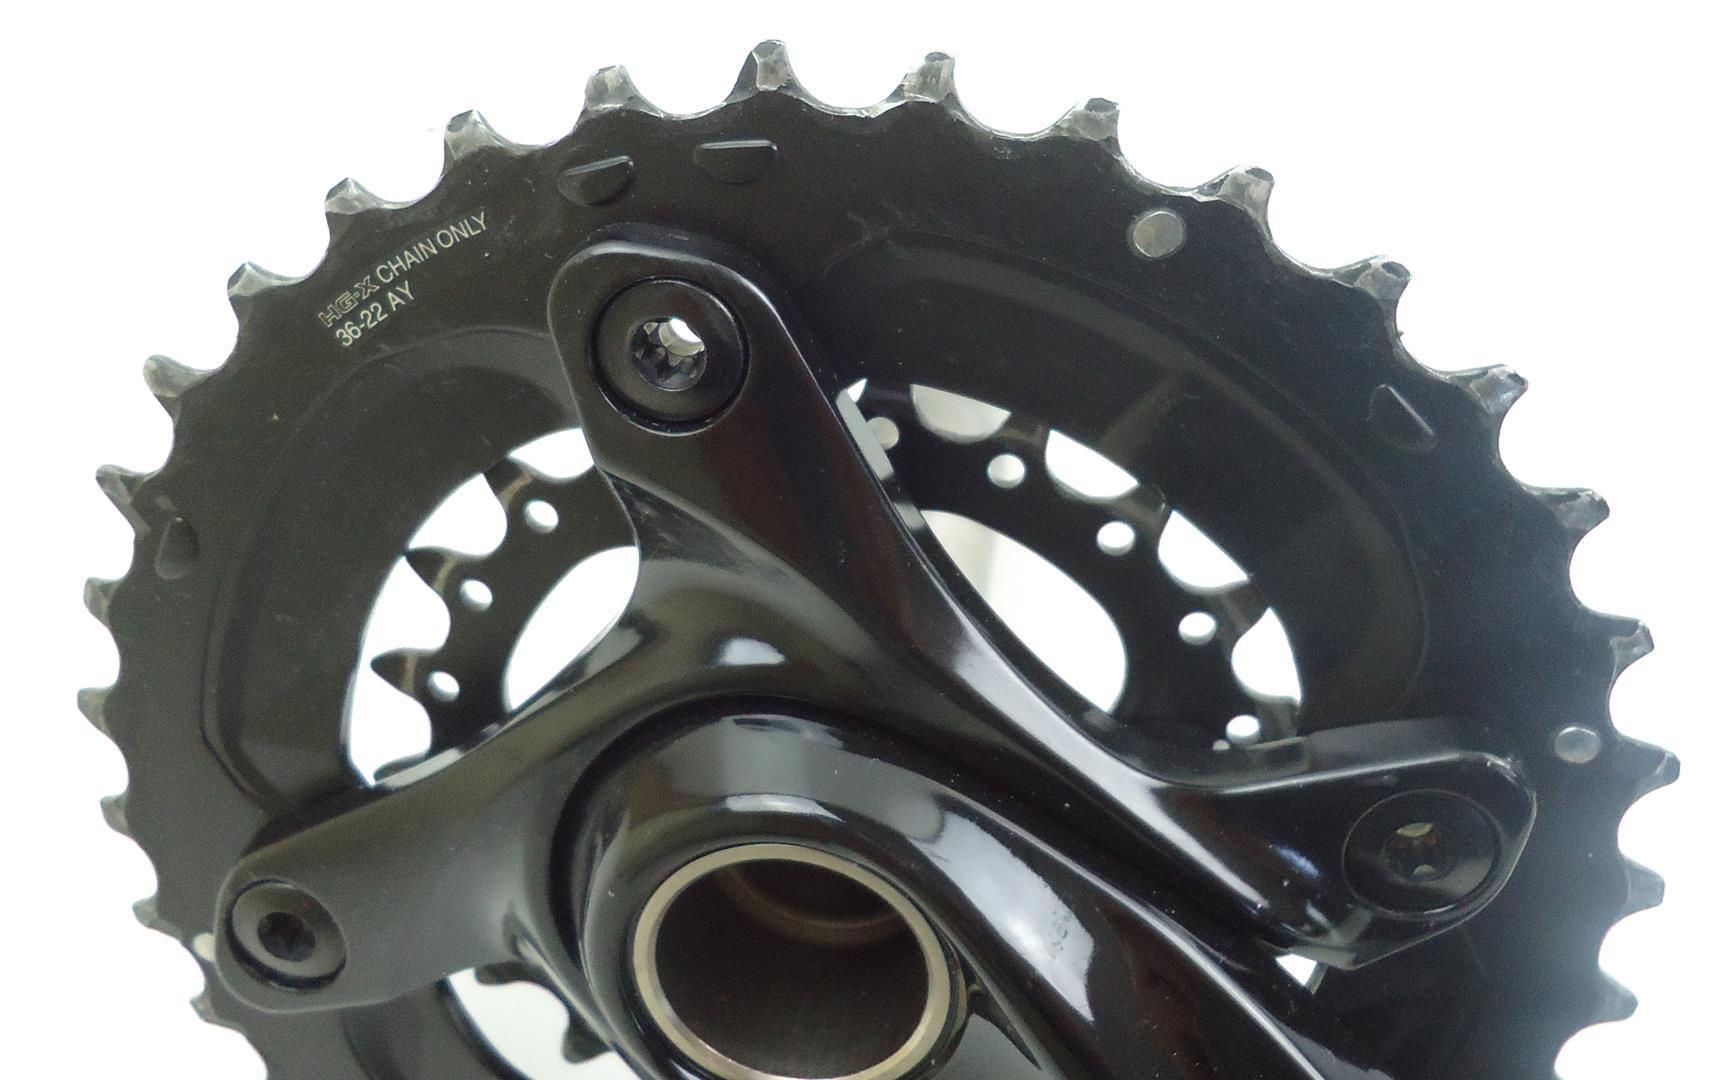 Pedivela Duplo Bicicleta Shimano Deore M627 2x10 36-22 175mm 10 velocidades - USADO